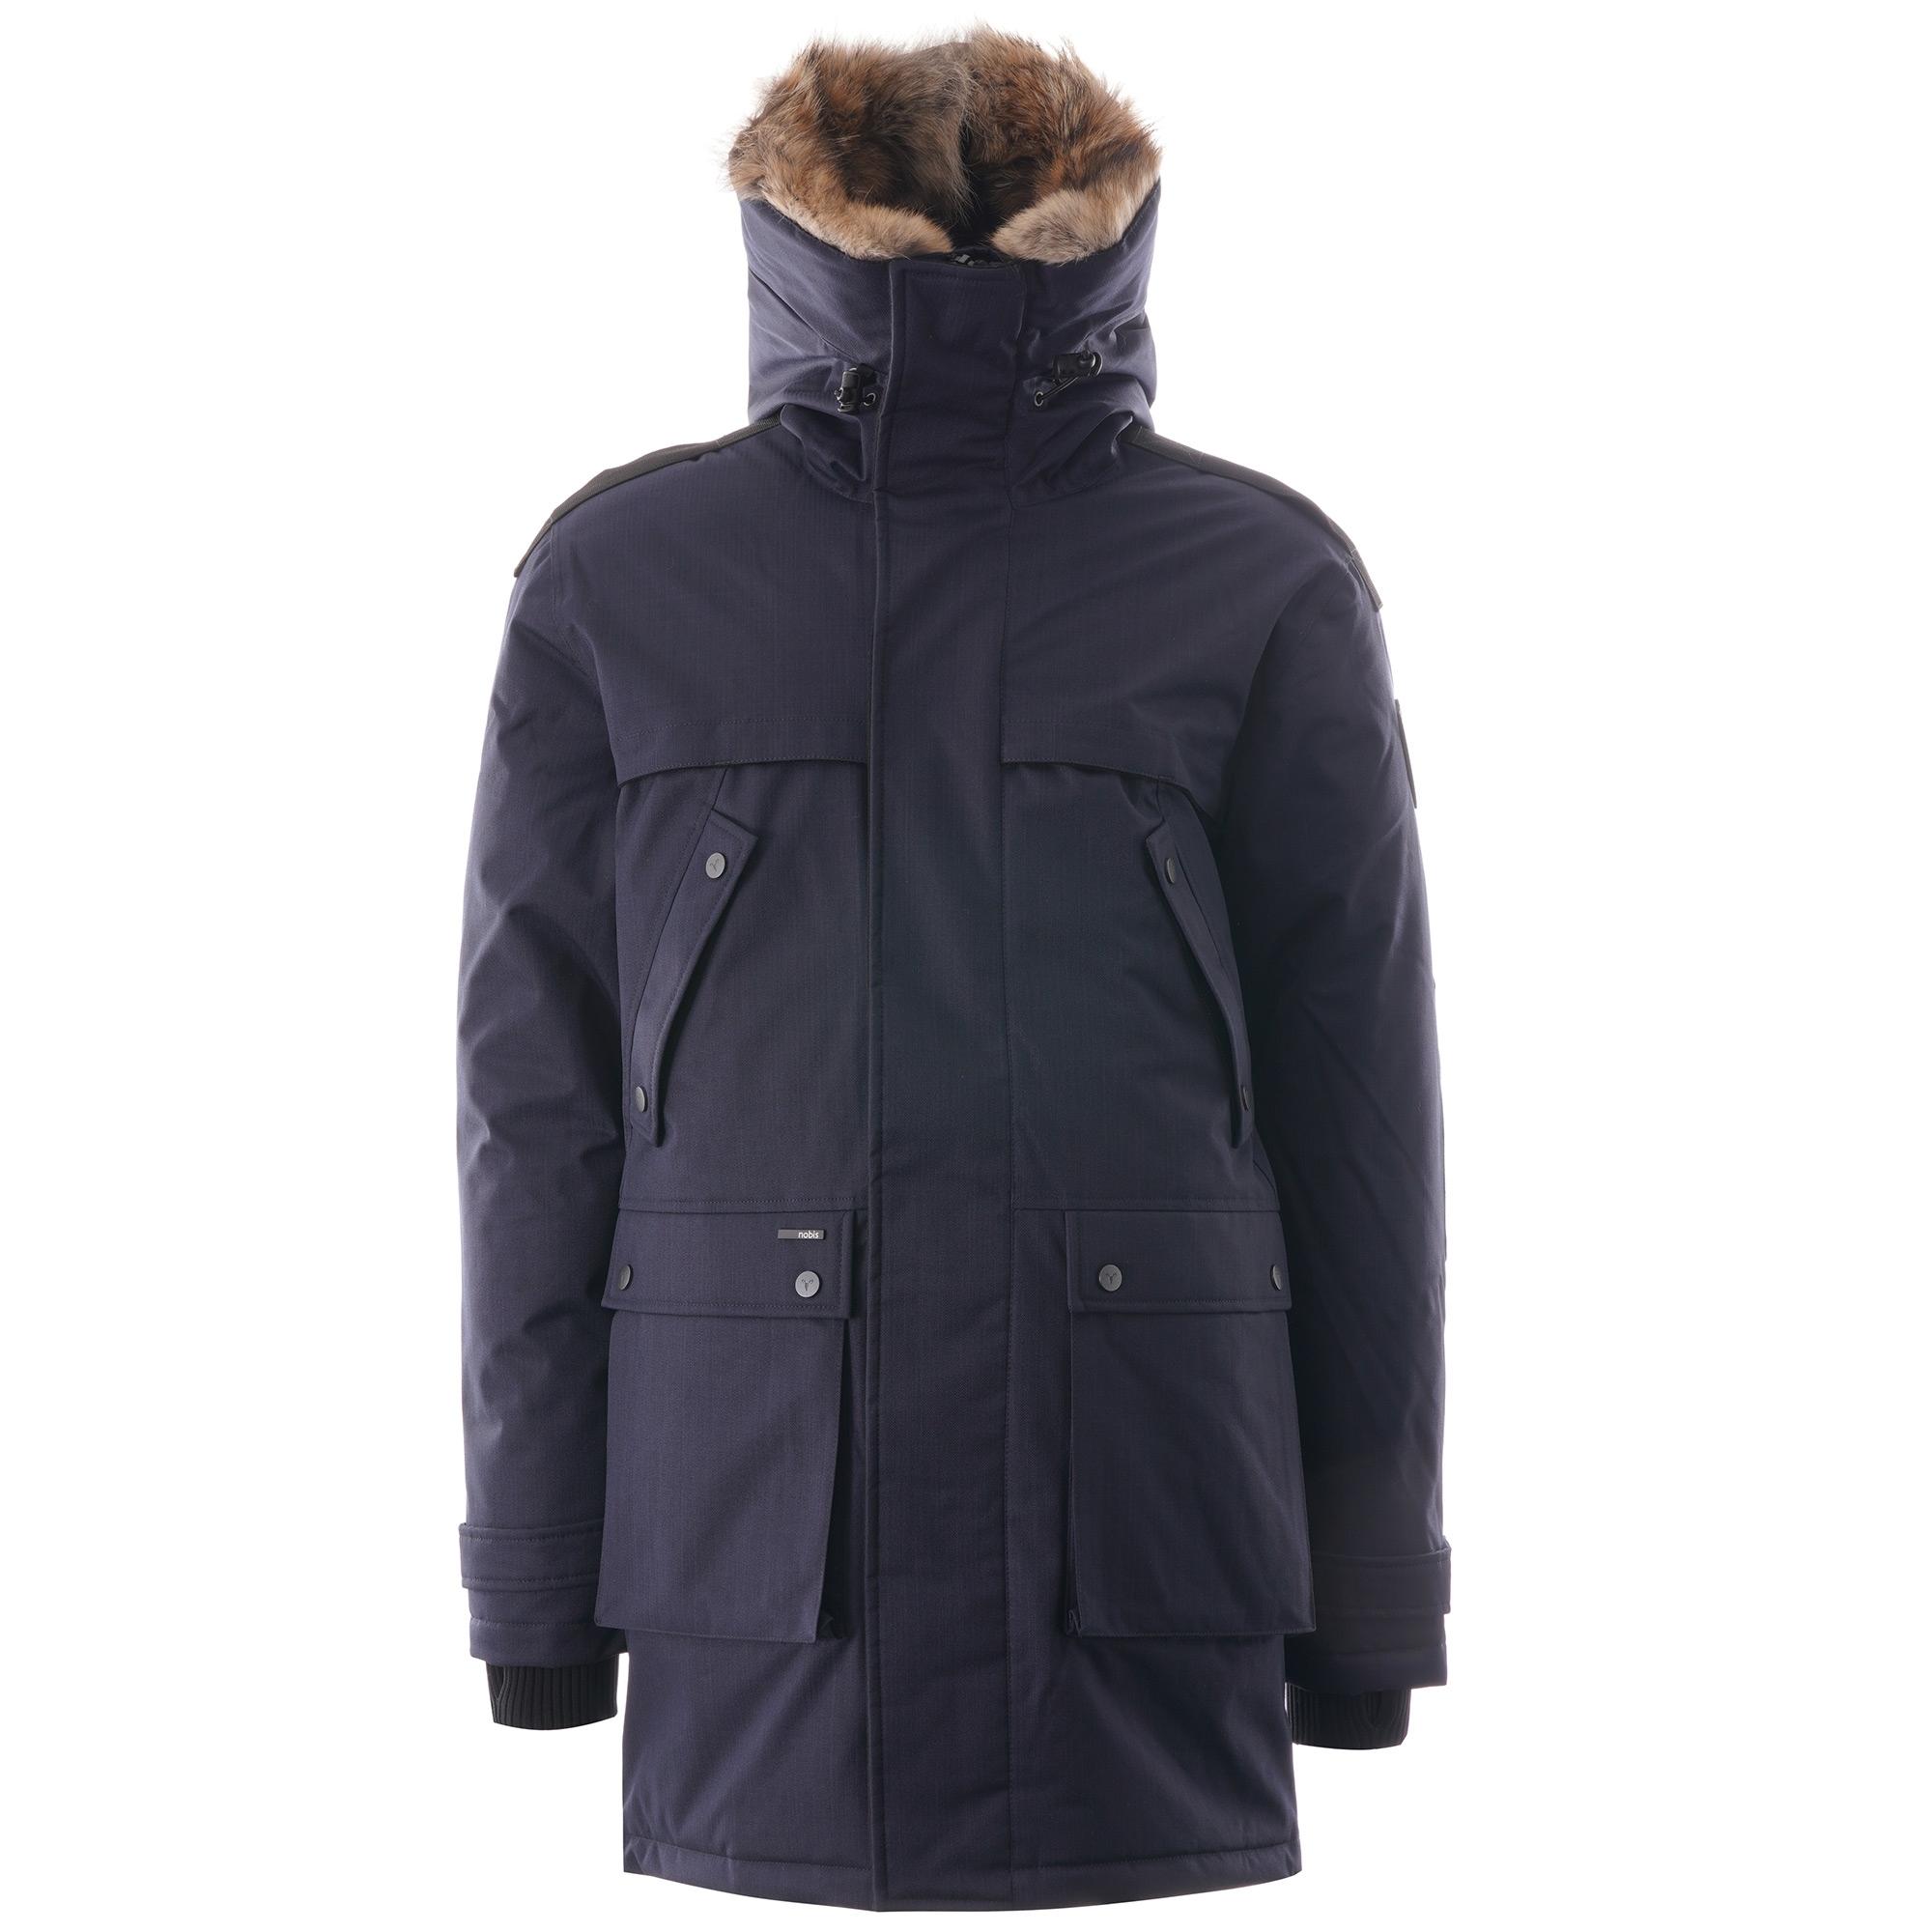 Nobis coat